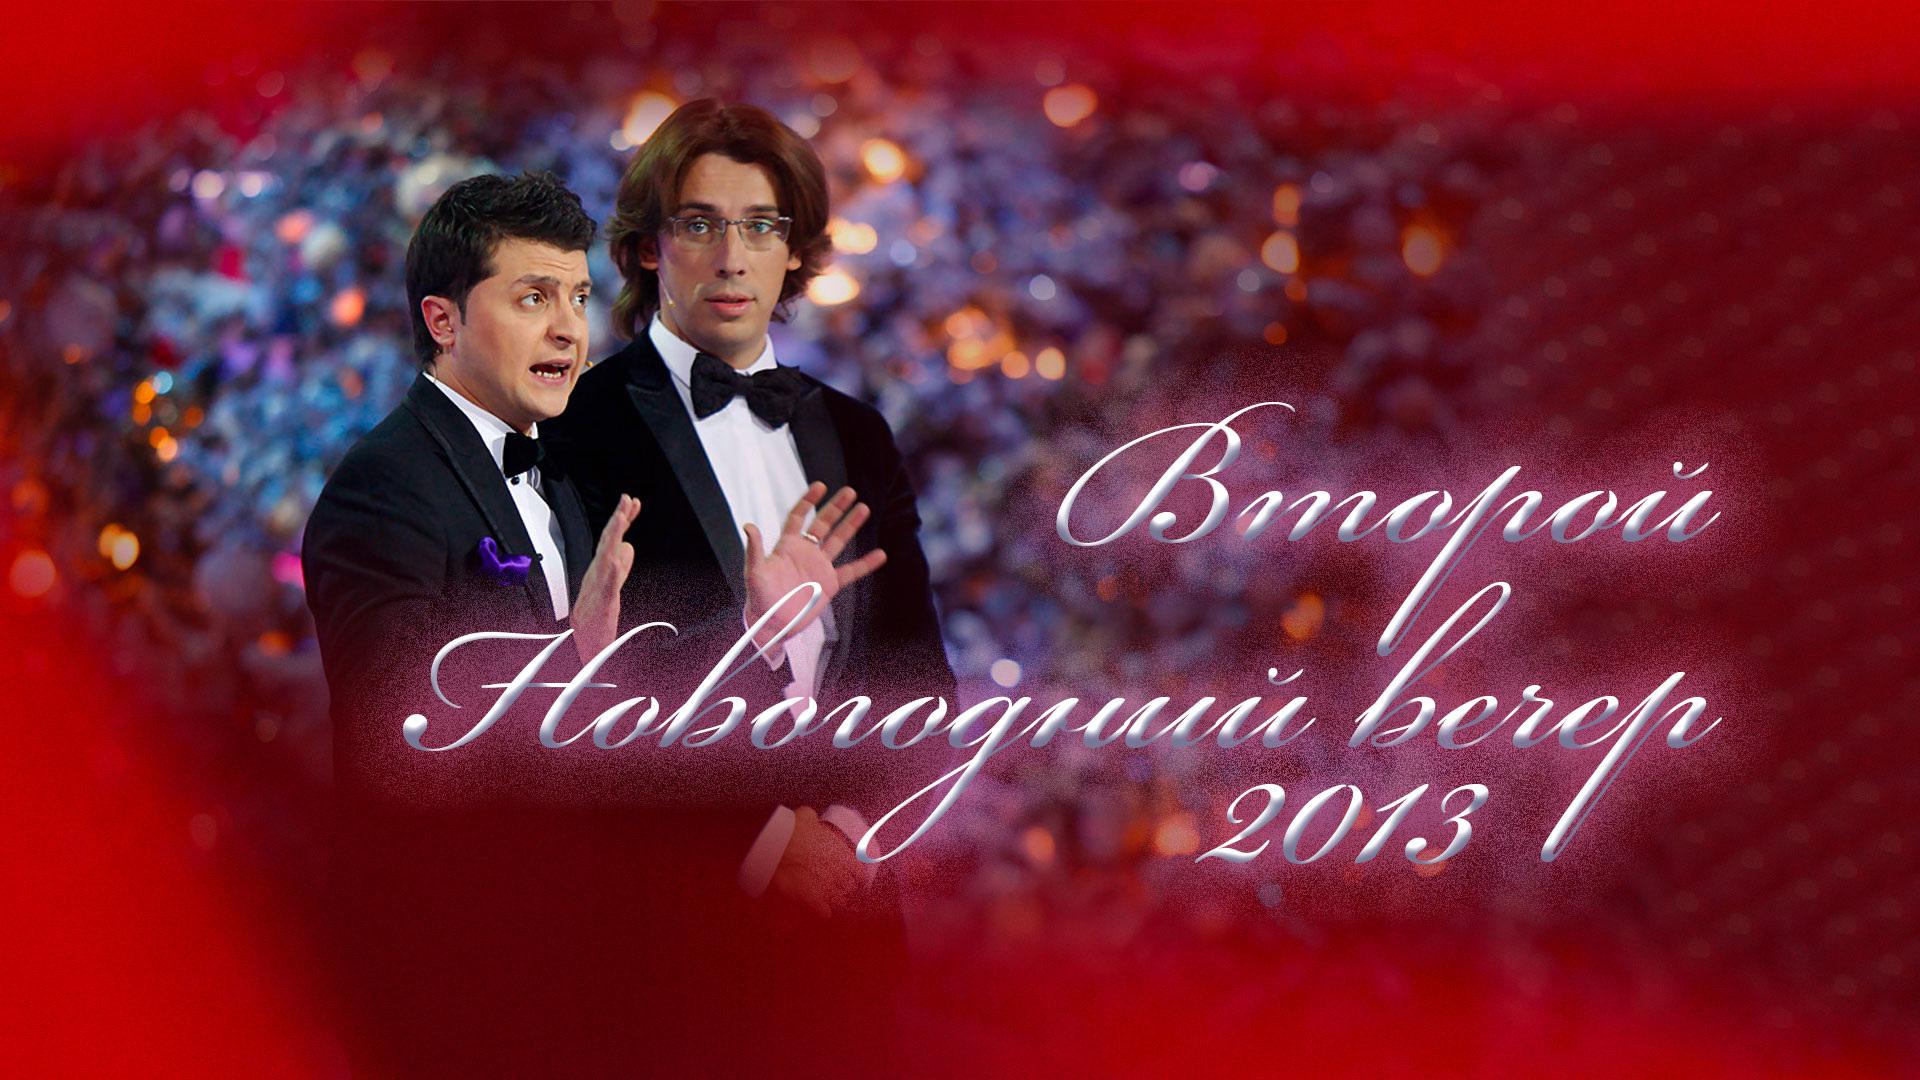 Второй Новогодний вечер-2013